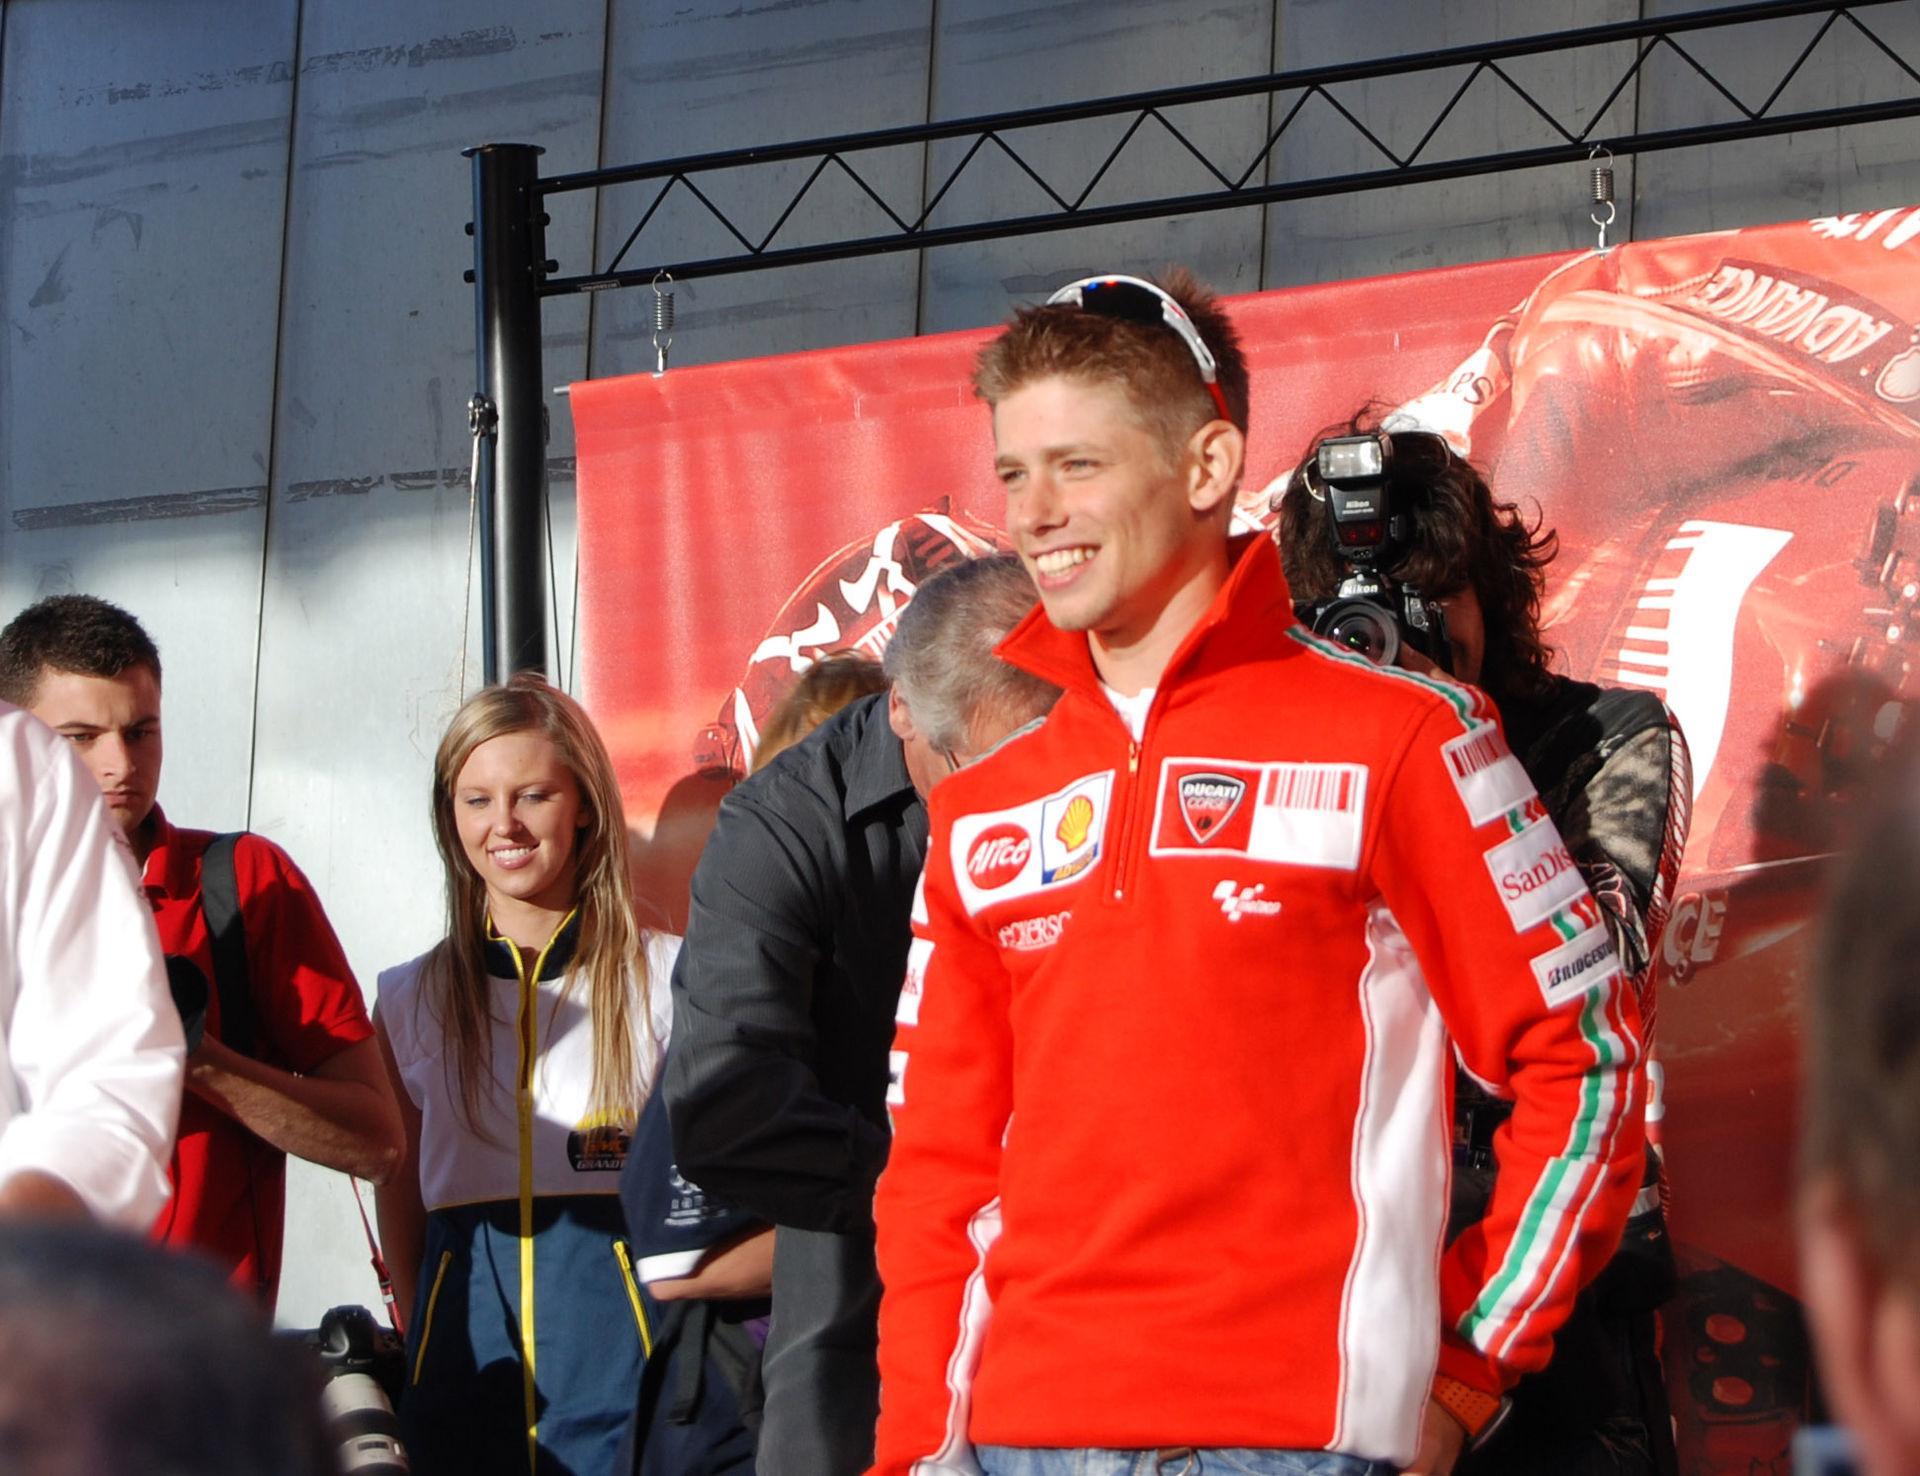 2007 Grand Prix motorcycle racing season - Wikipedia